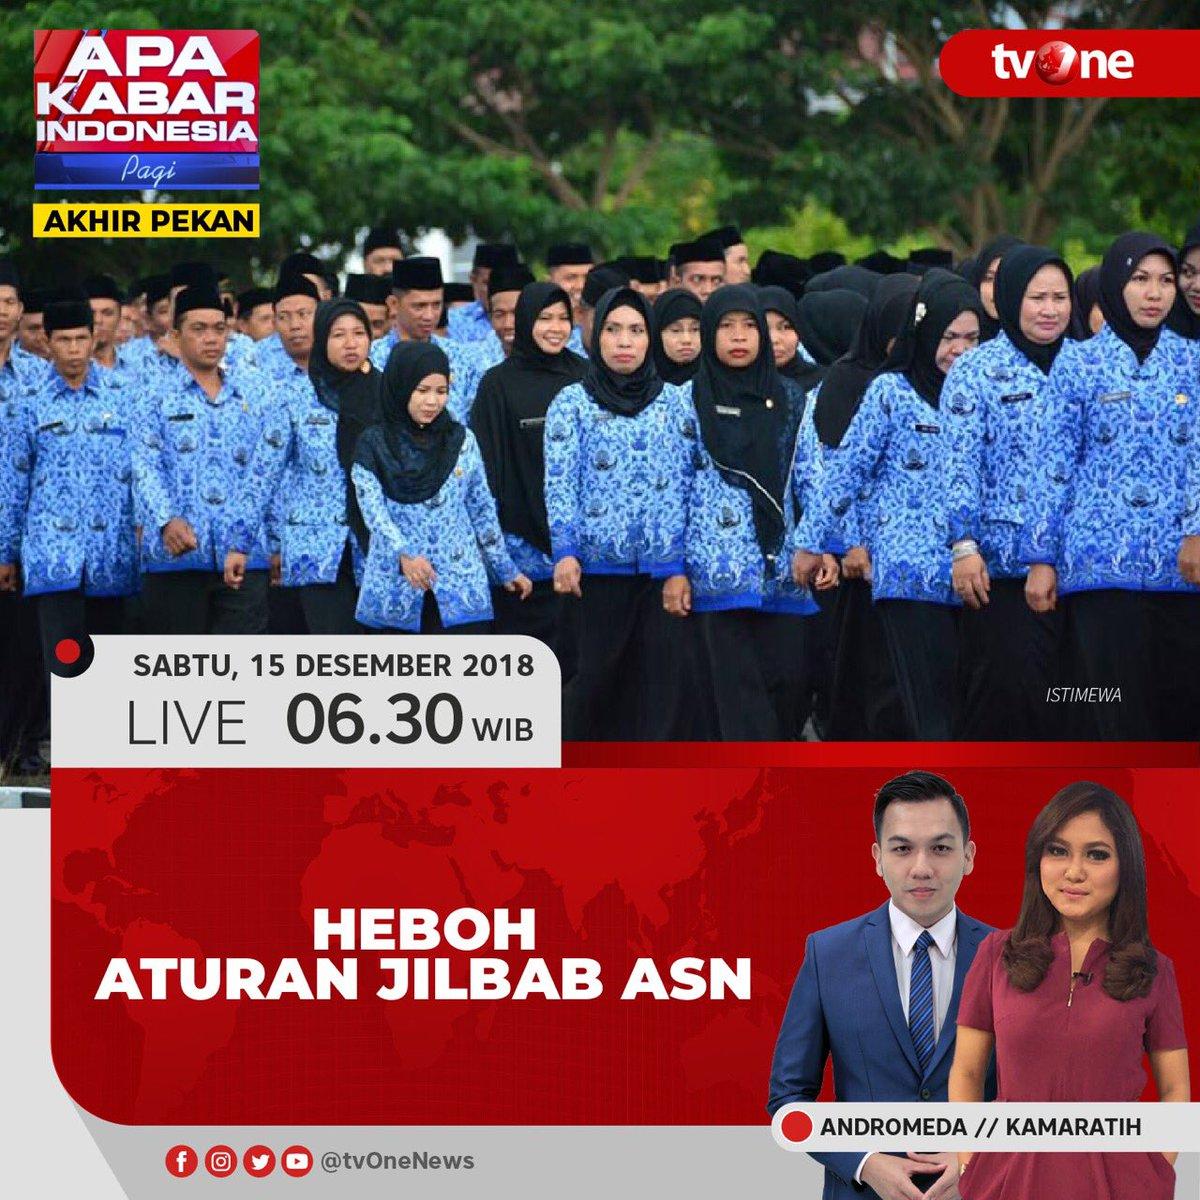 Heboh Aturan Jilbab ASN https://t.co/BBl3S46ff0